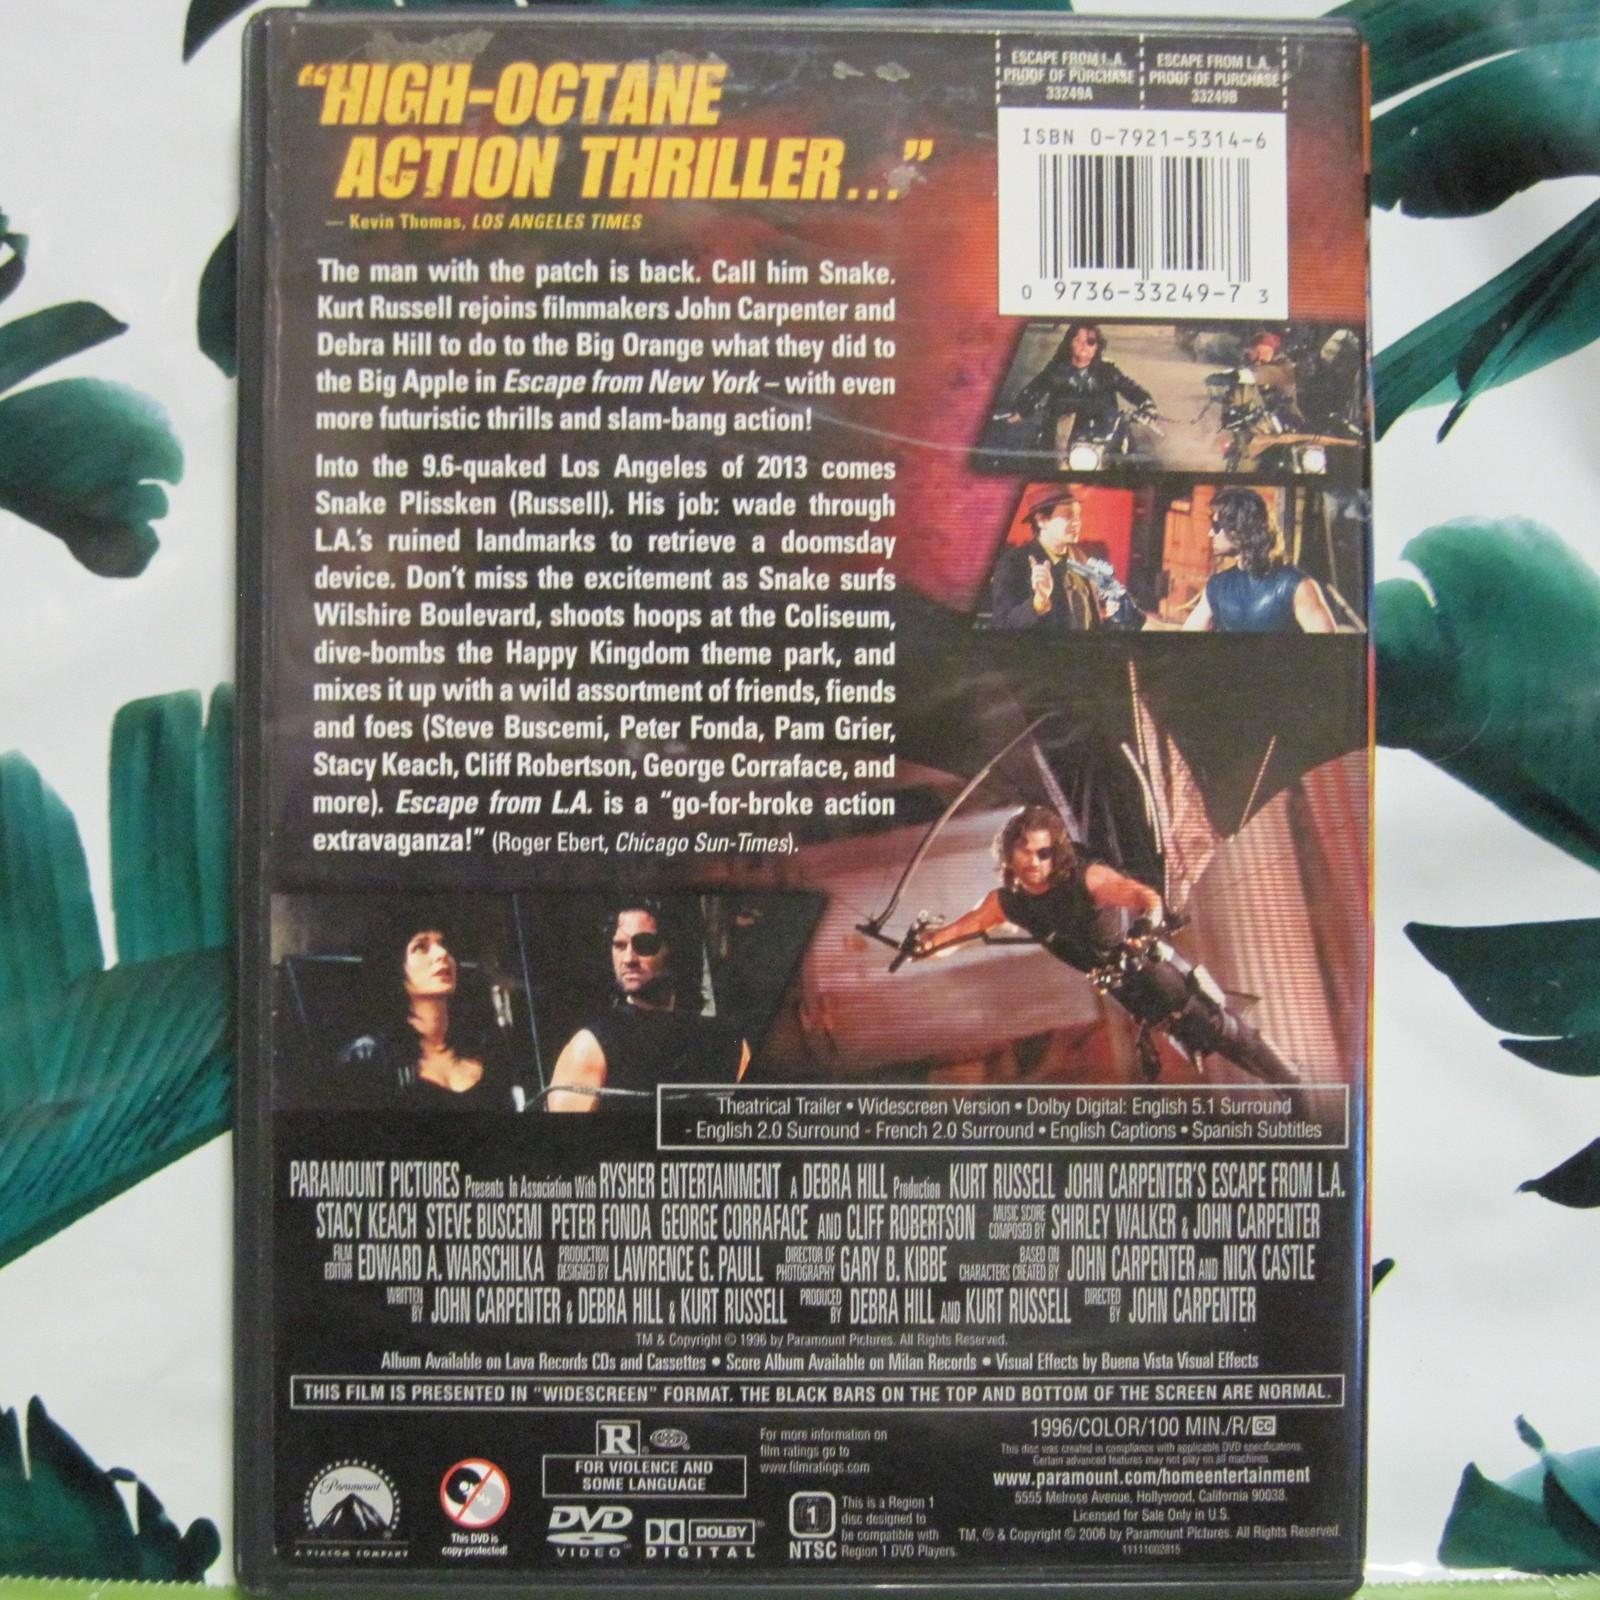 DVD Escape From L.A. Kurt Russell Stacy Keach Steve Buscemi Widescreen image 2